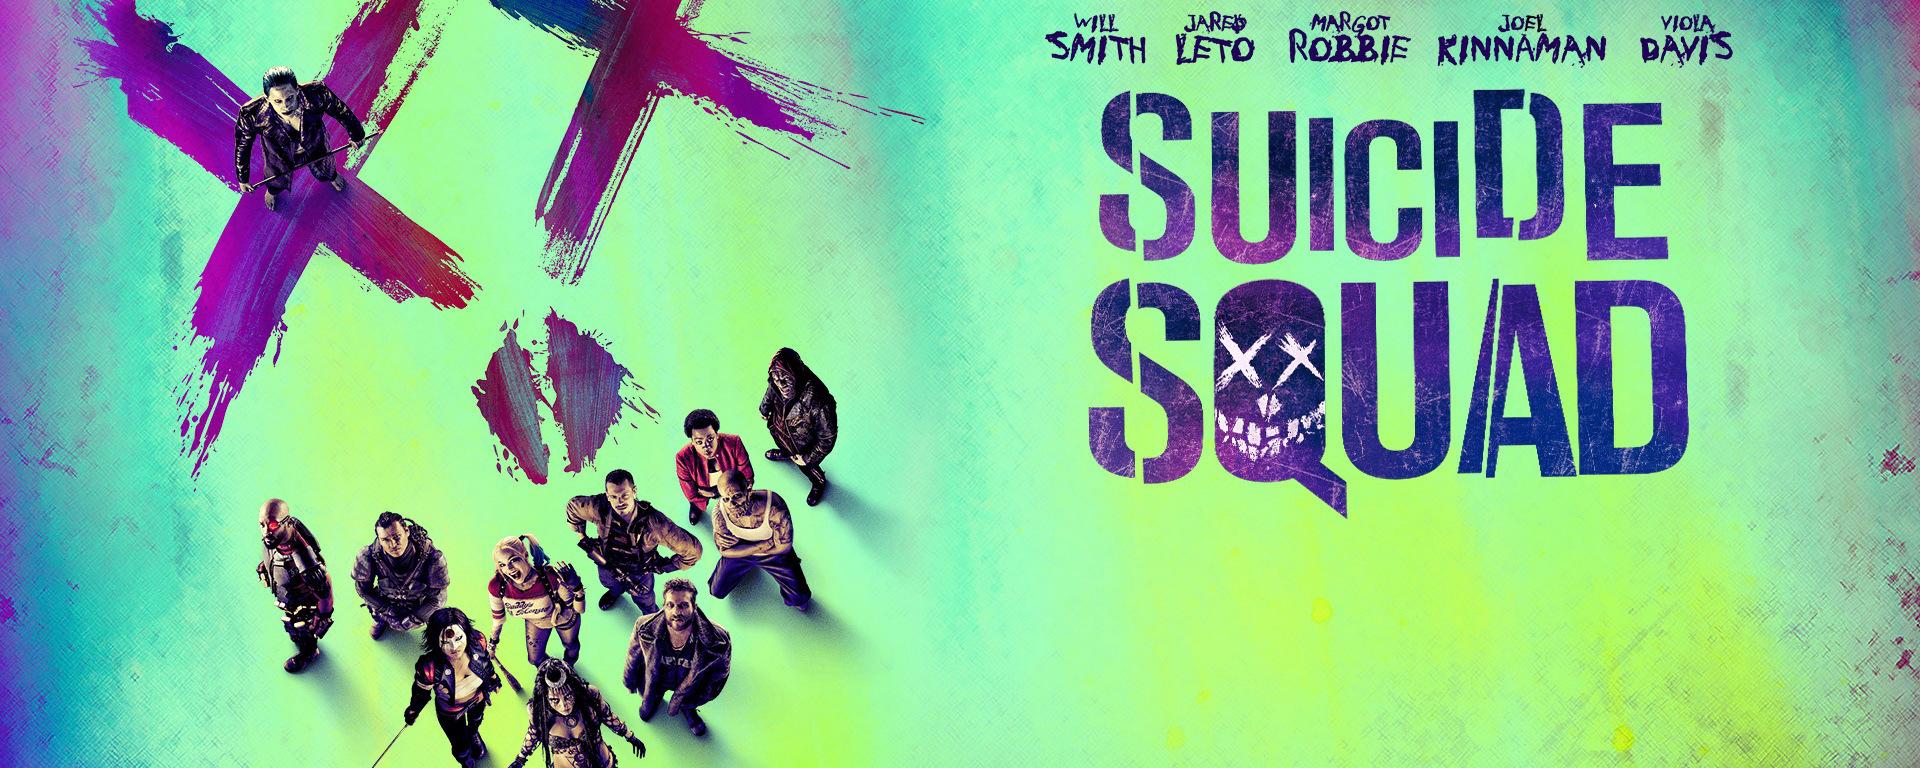 suicide-squad-2016-poster-b1pk